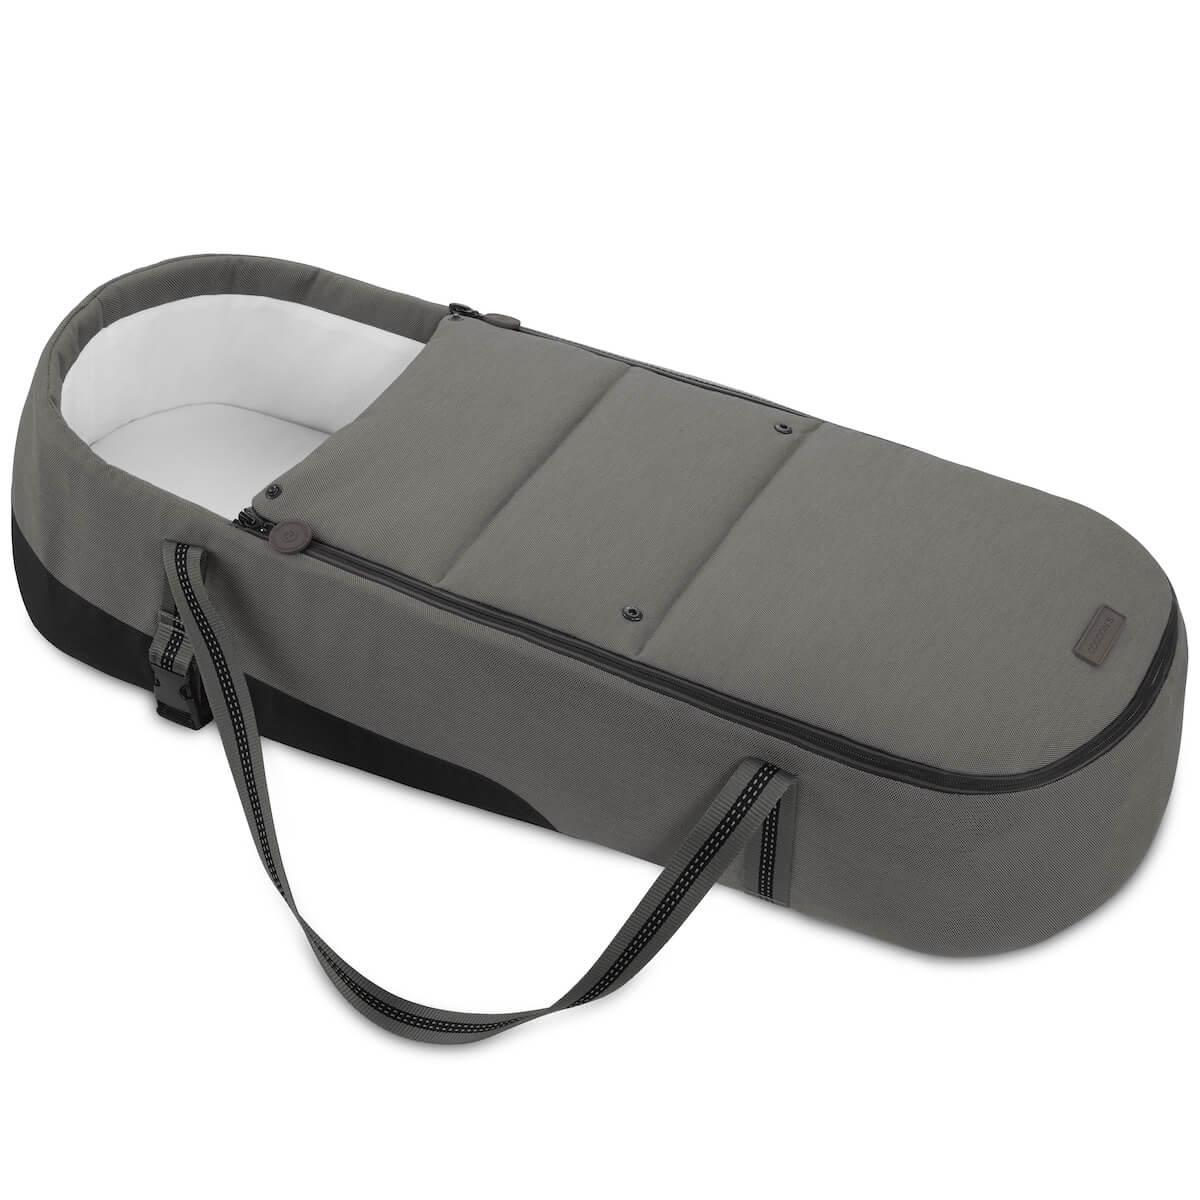 Saco silla COCOON S Cybex Soho grey